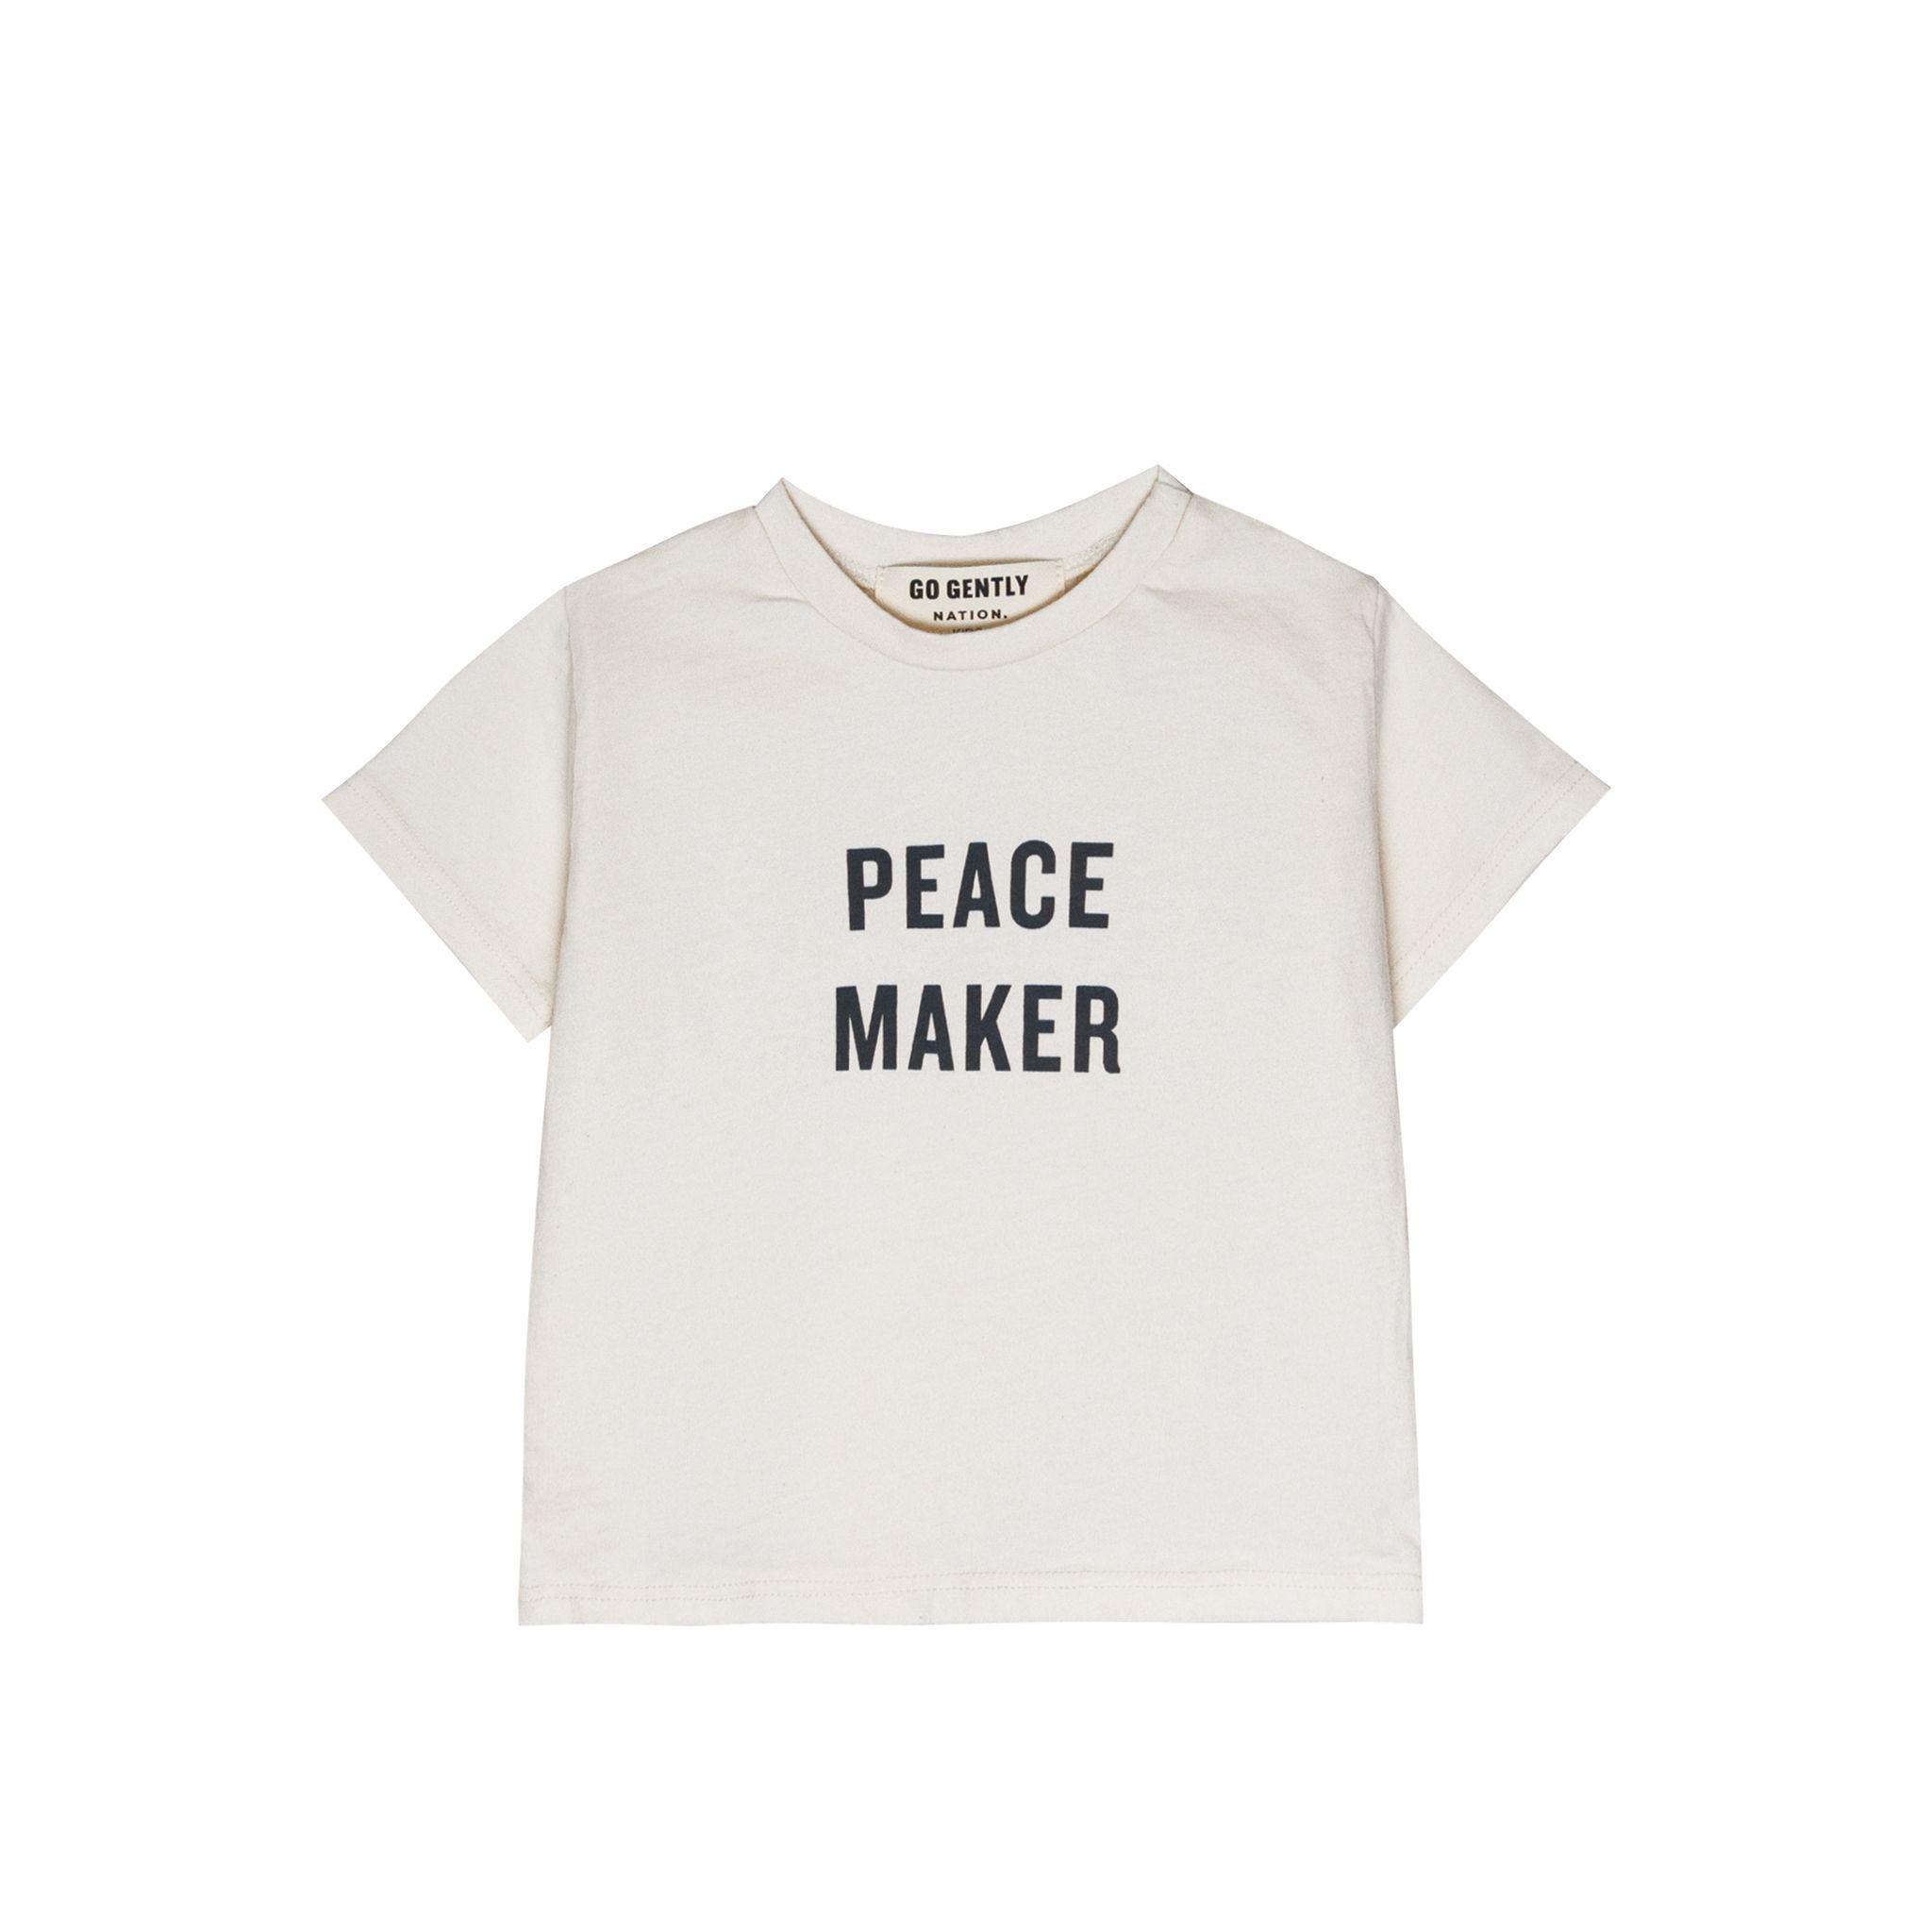 GOGENTLYNATION Peacemaker Tee